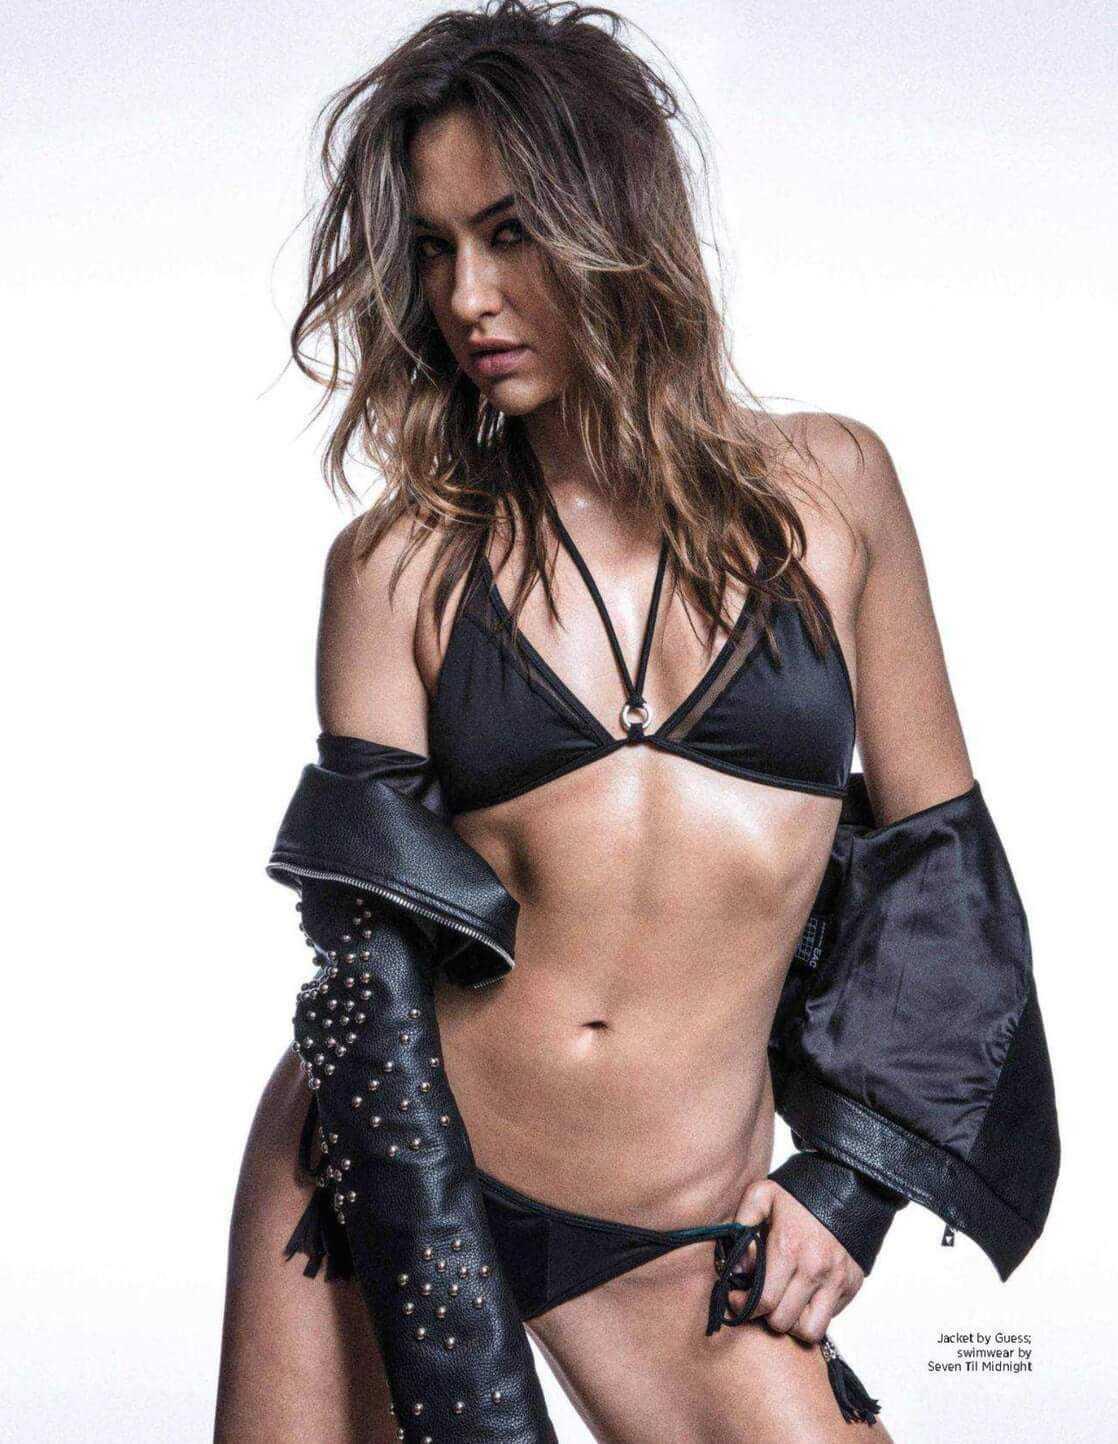 Tasya Teles hot bikini pictures